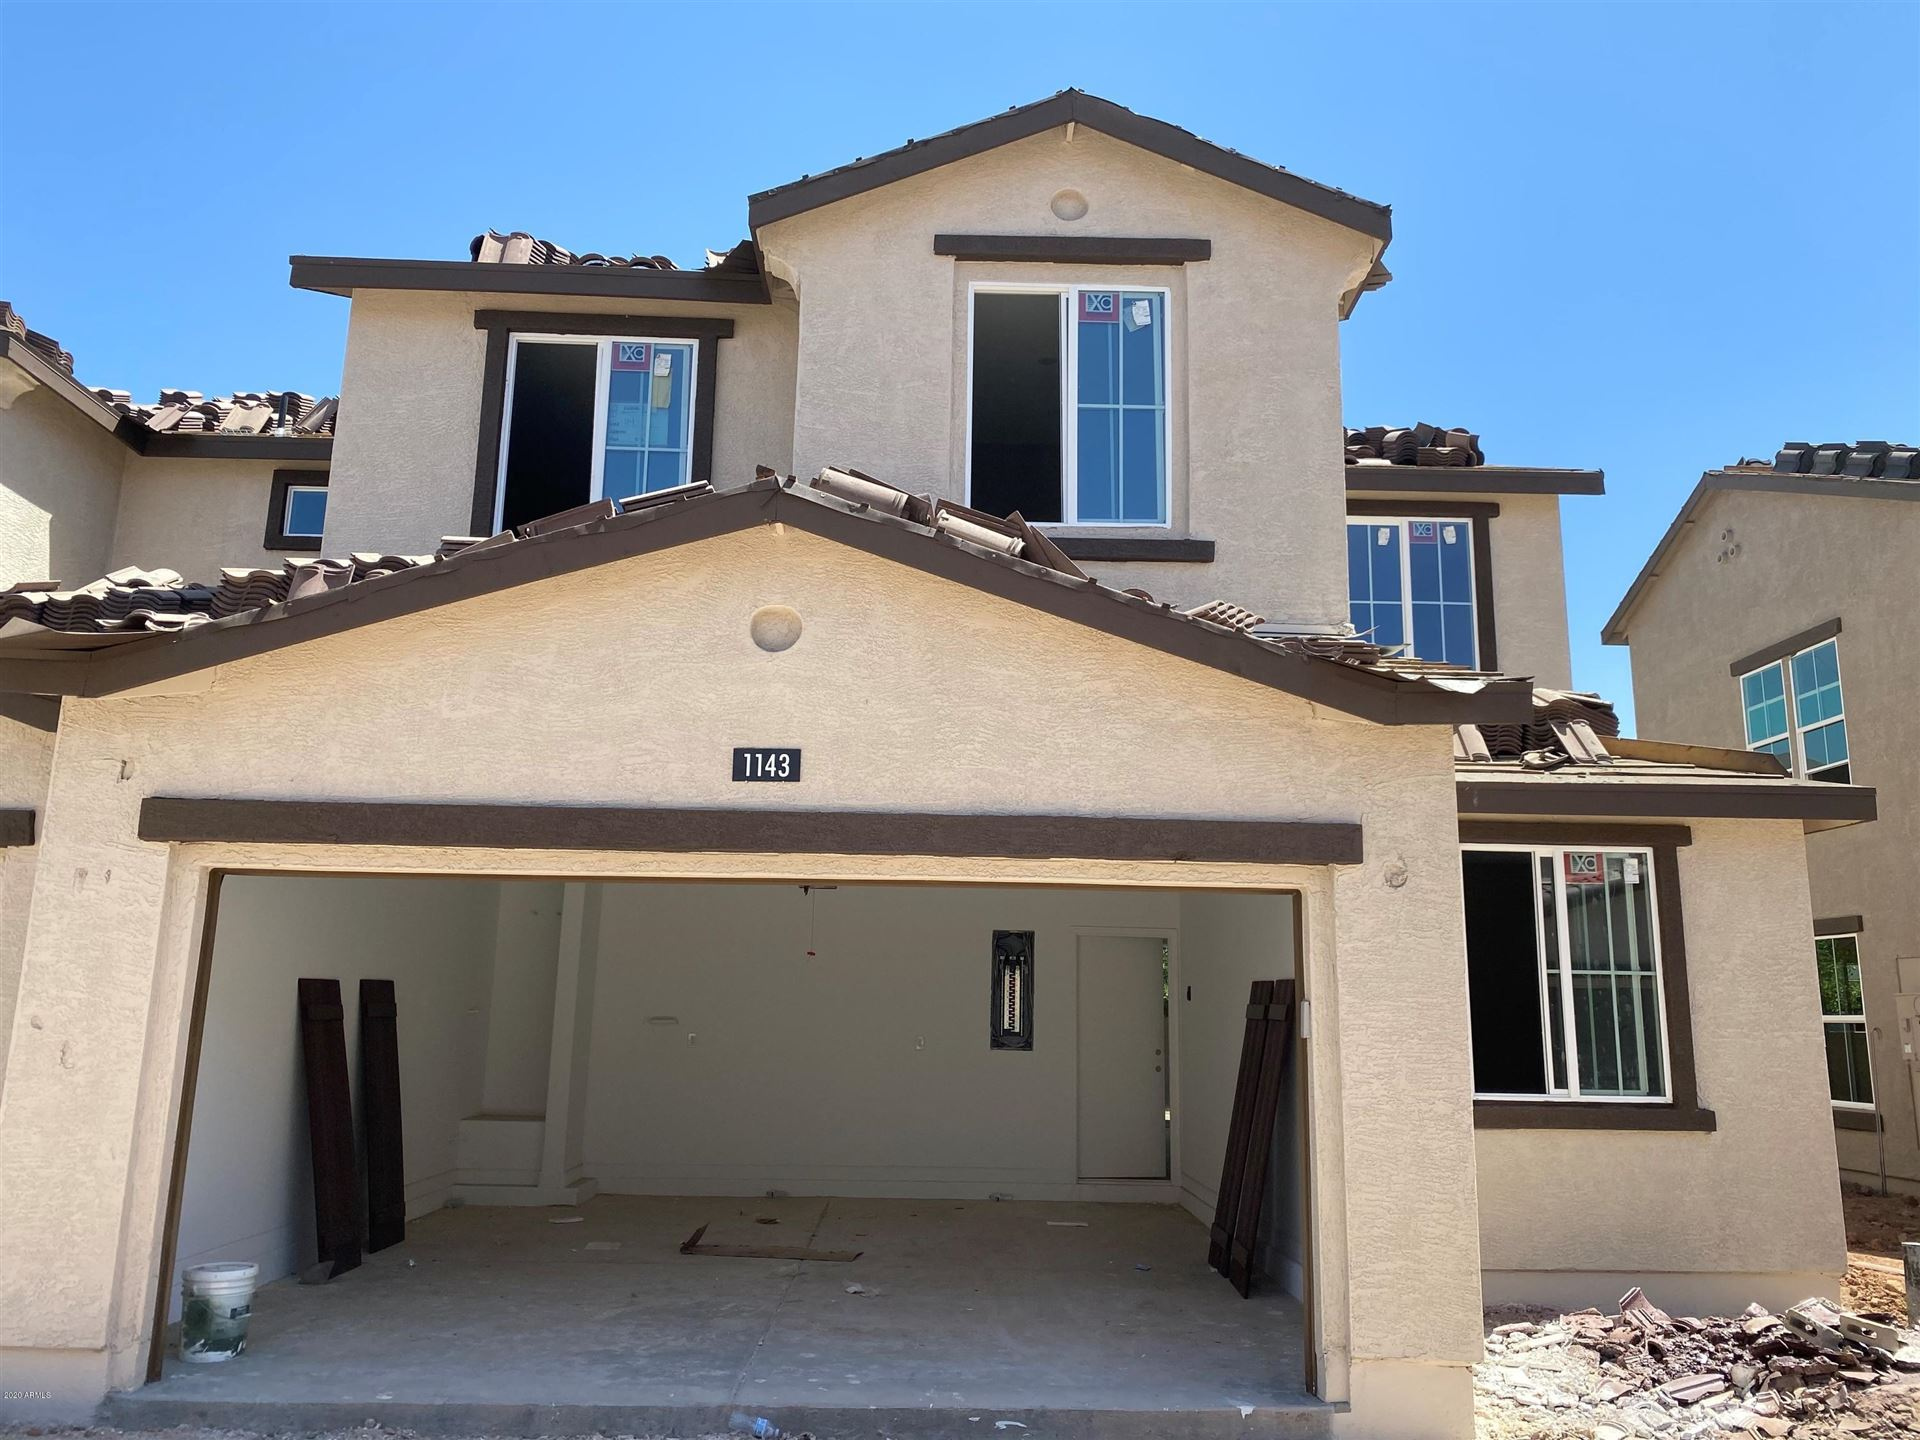 1255 N ARIZONA Avenue #1143, Chandler, AZ 85225 - #: 6034947